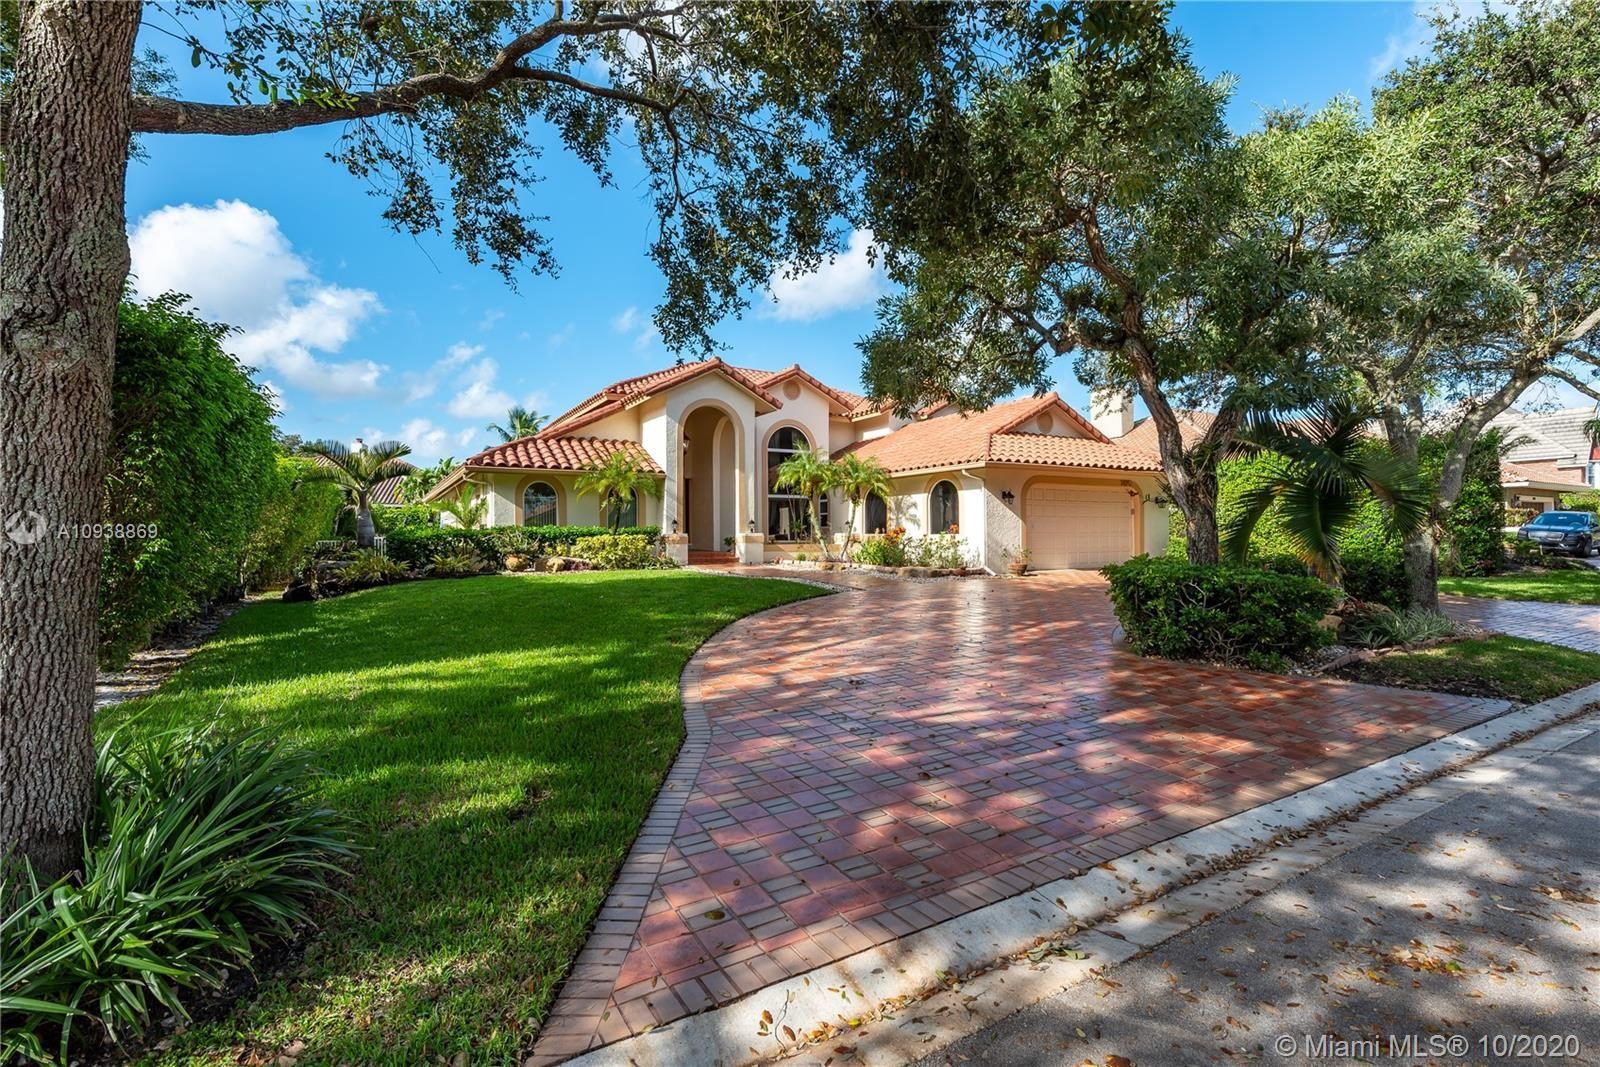 1870 Merion Ln, Coral Springs, FL 33071 - #: A10938869